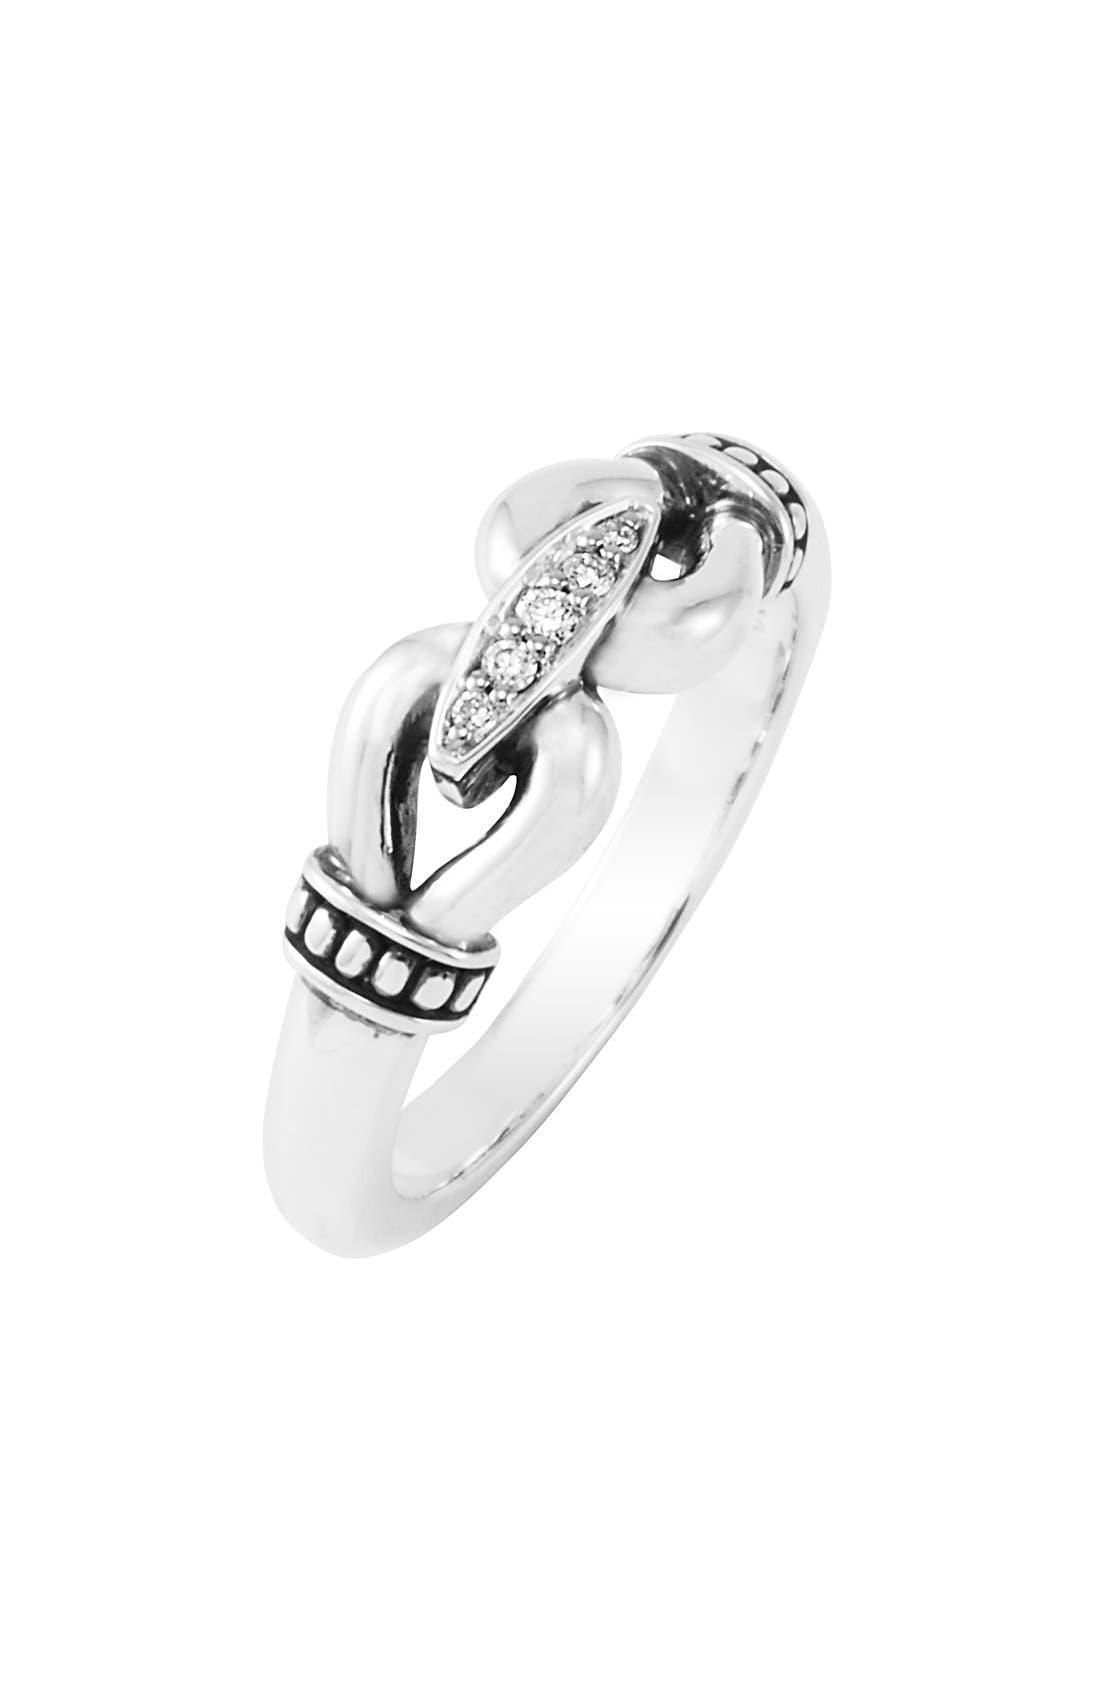 'Derby' Small Diamond Ring,                             Main thumbnail 1, color,                             040